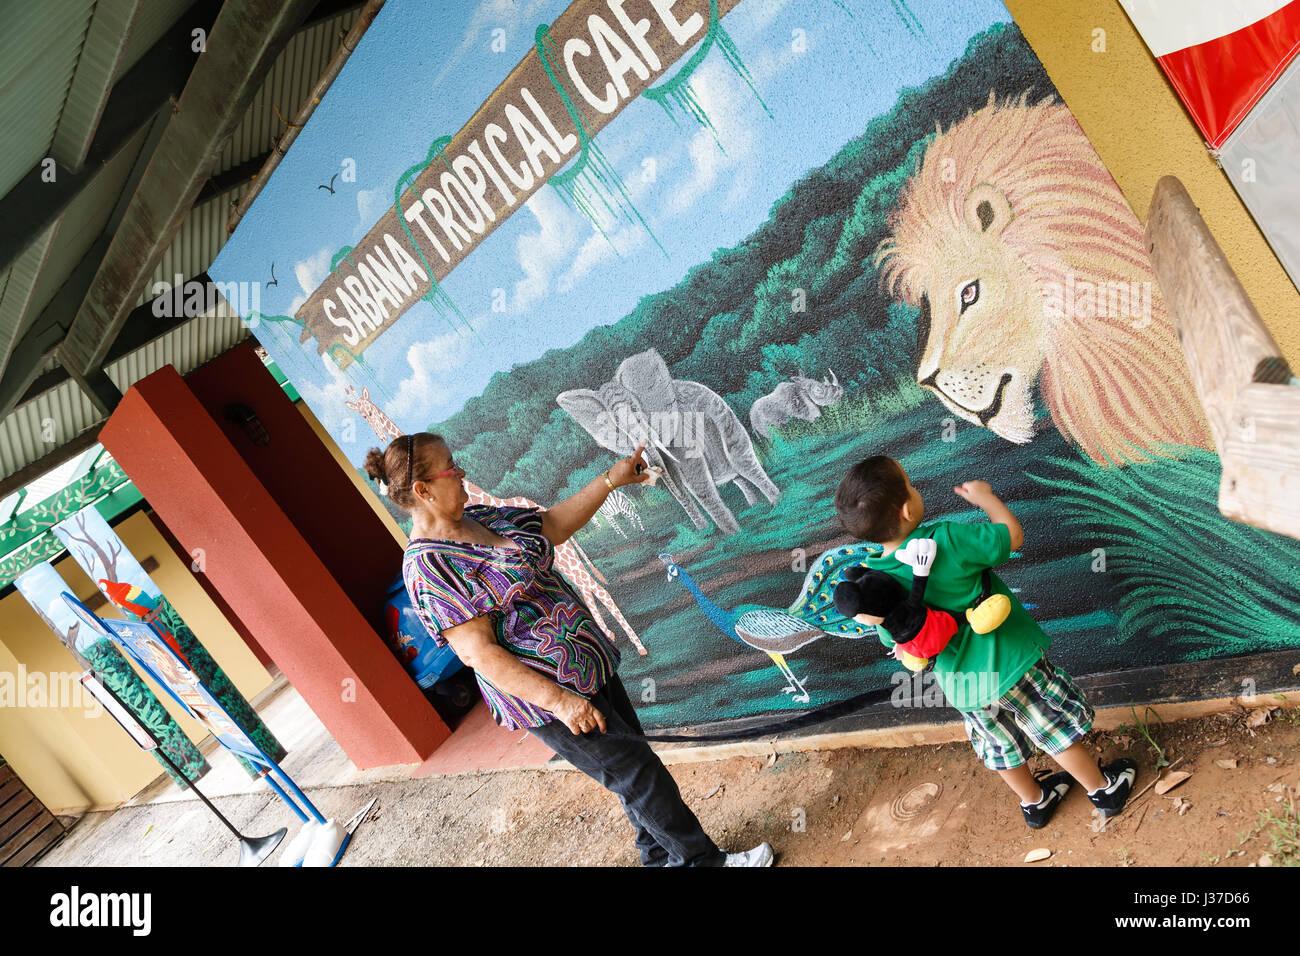 Woman and boy at mural of Sabana Tropical Cafe, Mayaguez Zoo (Juan A. Rivero), Puerto Rico - Stock Image